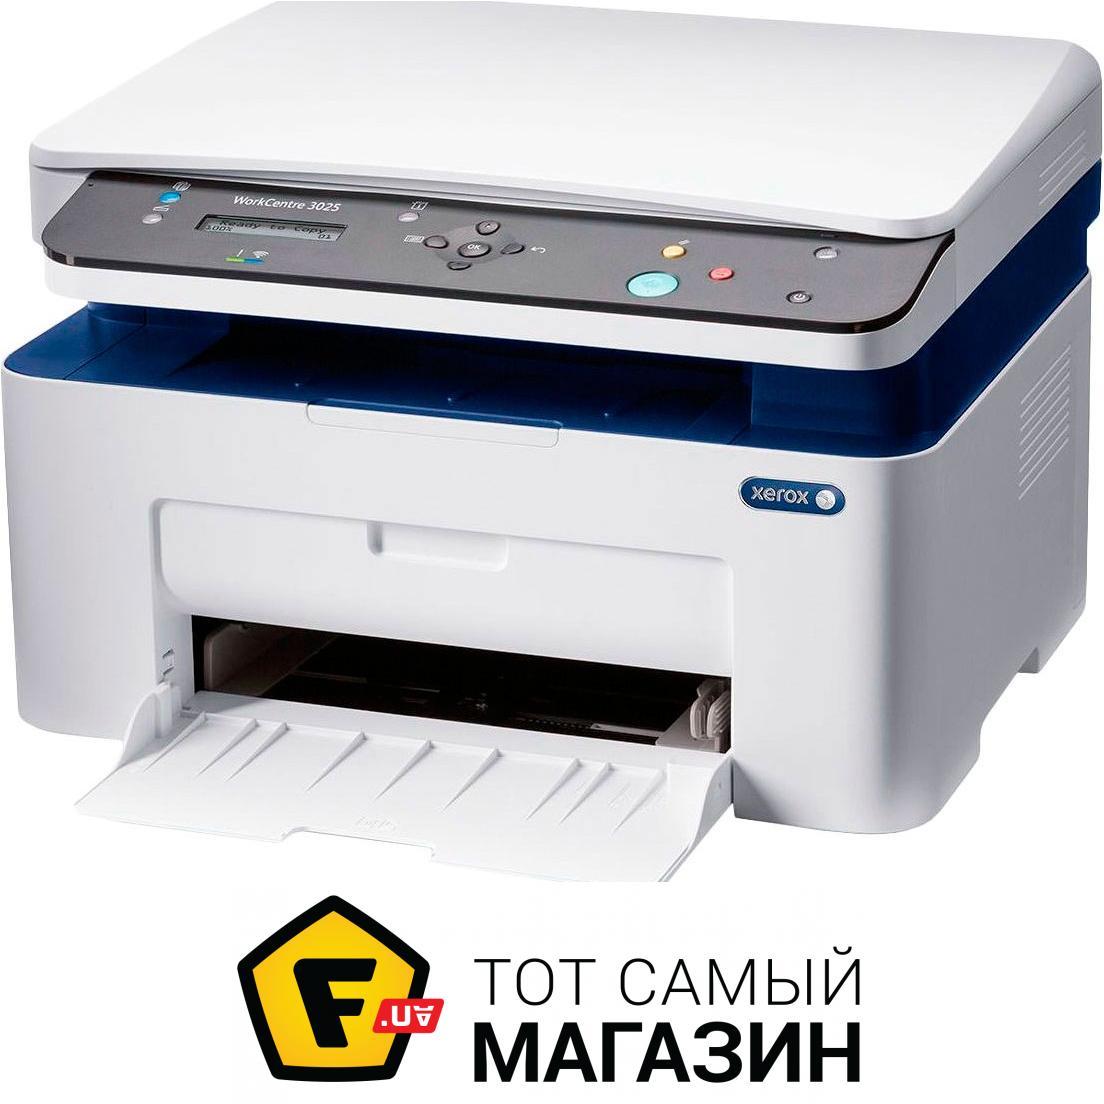 Xerox workcentre pro 215